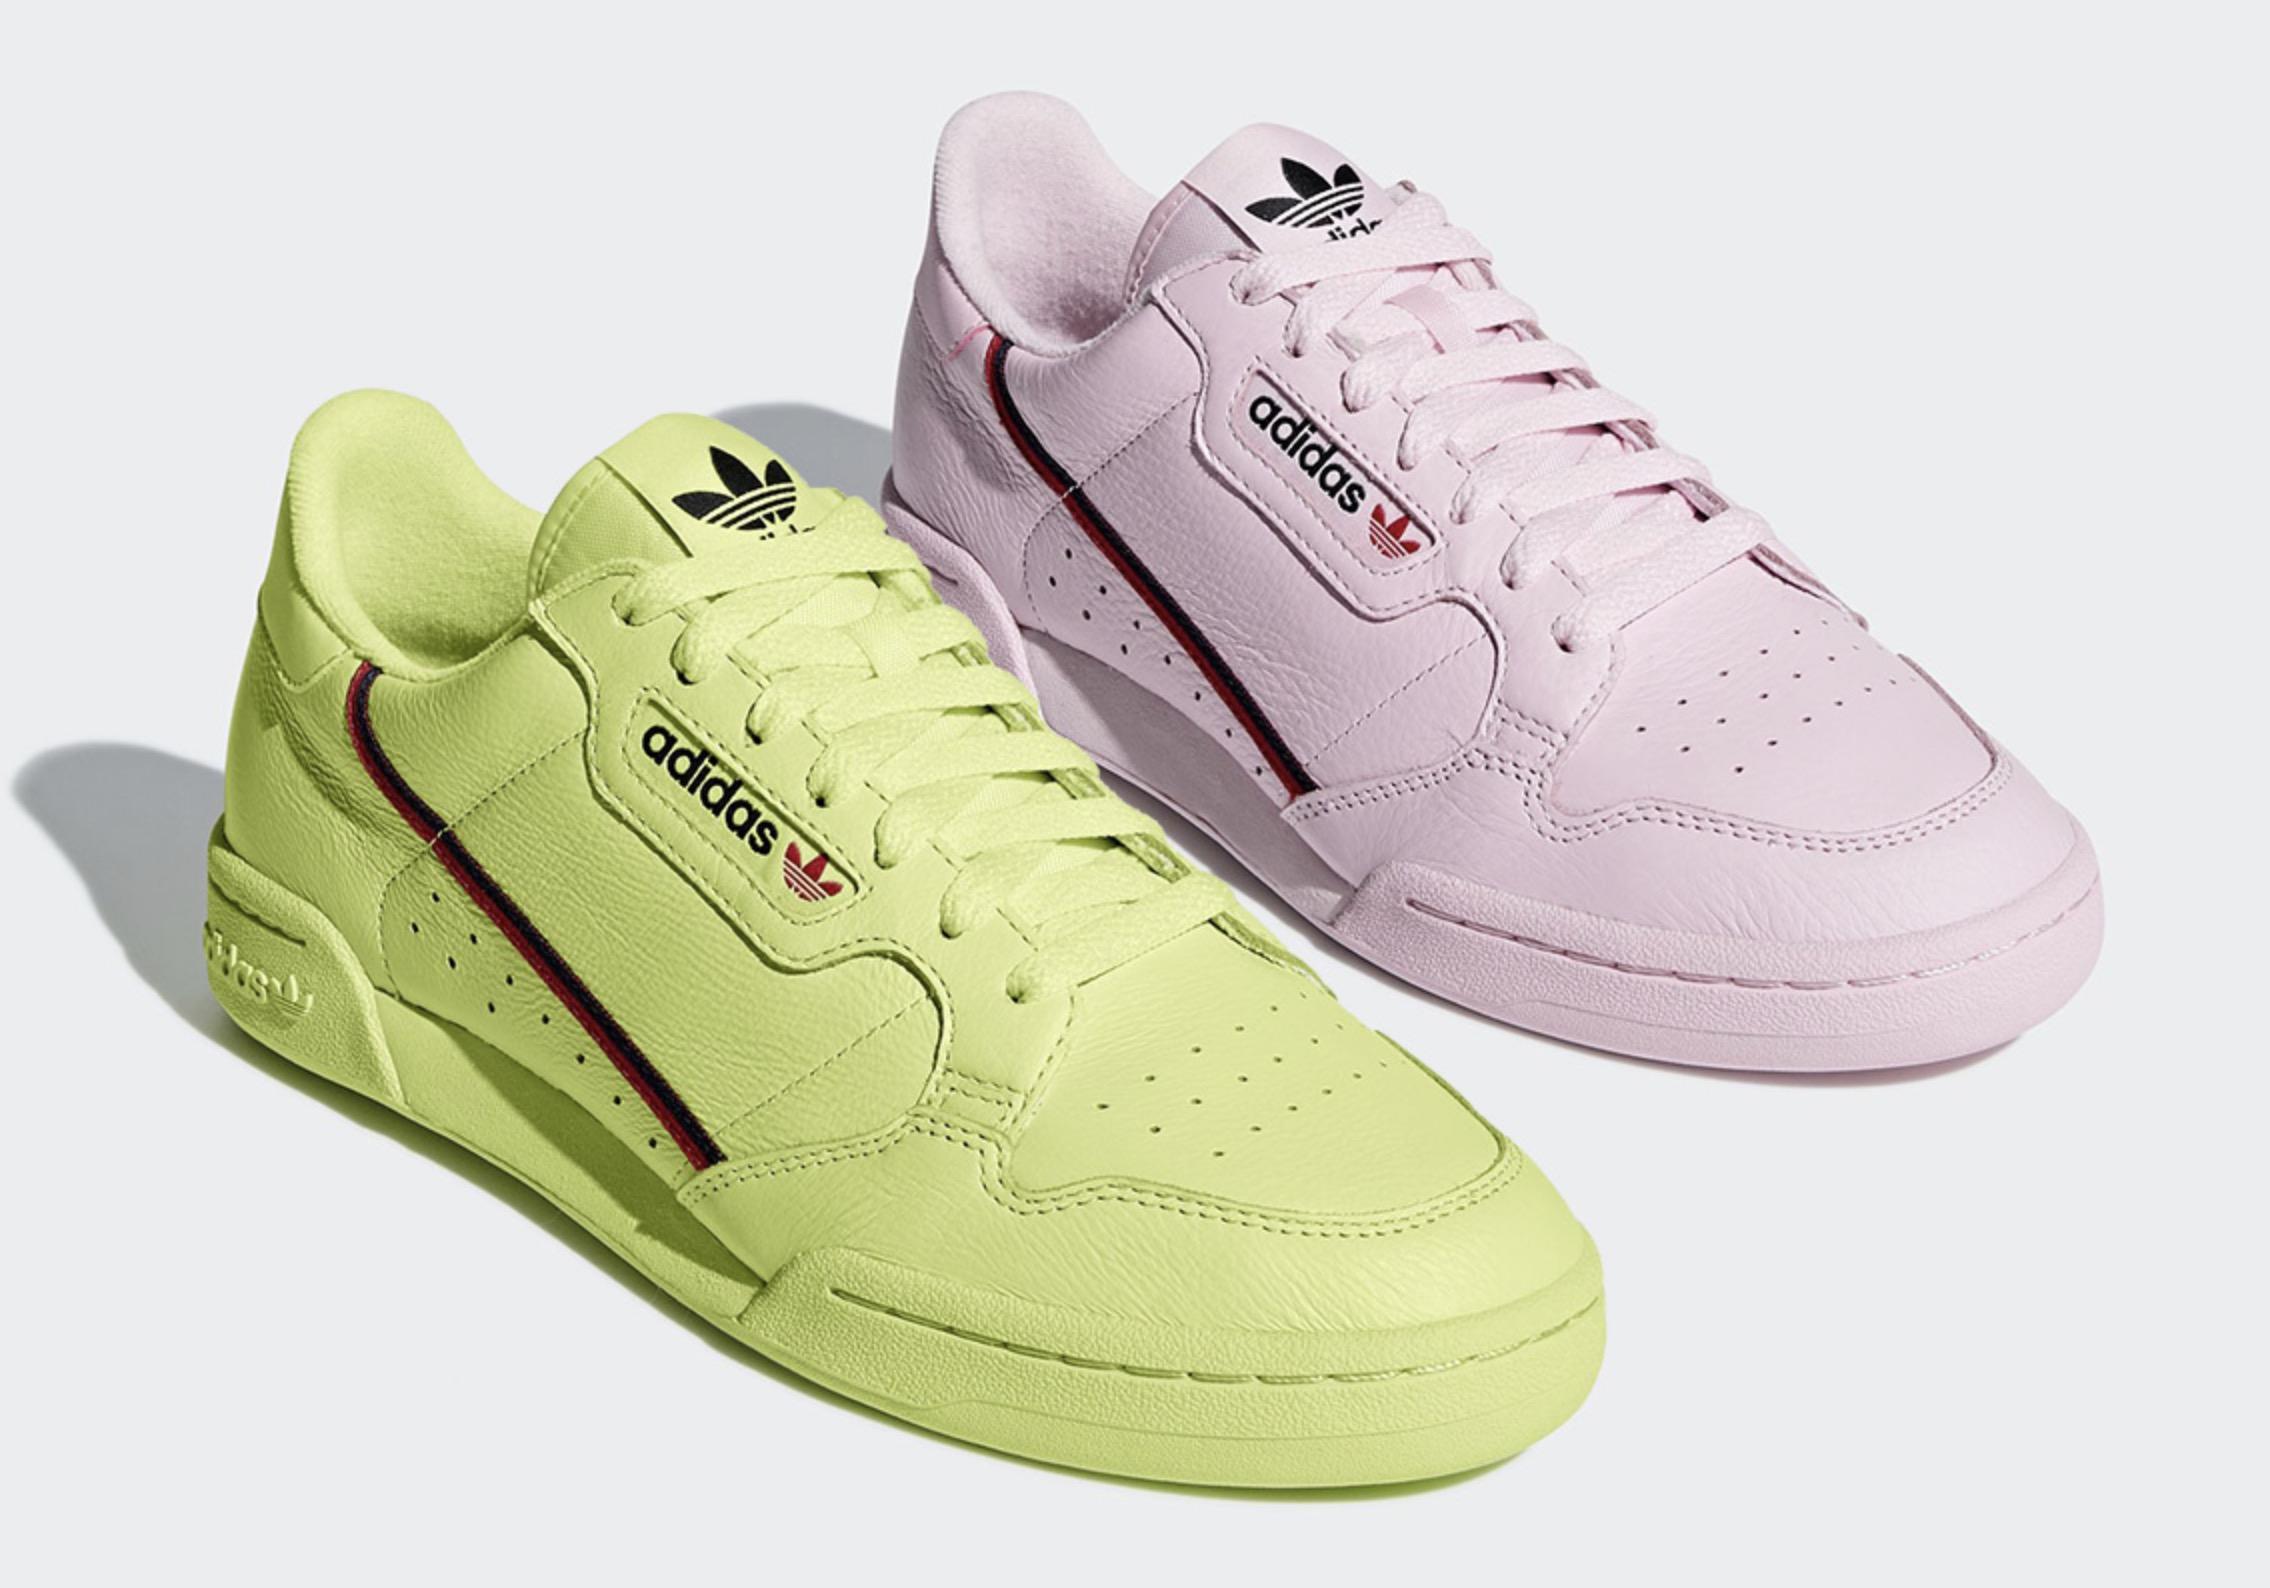 The Adidas Originals Continental 80 Gets a Pastel Makeover